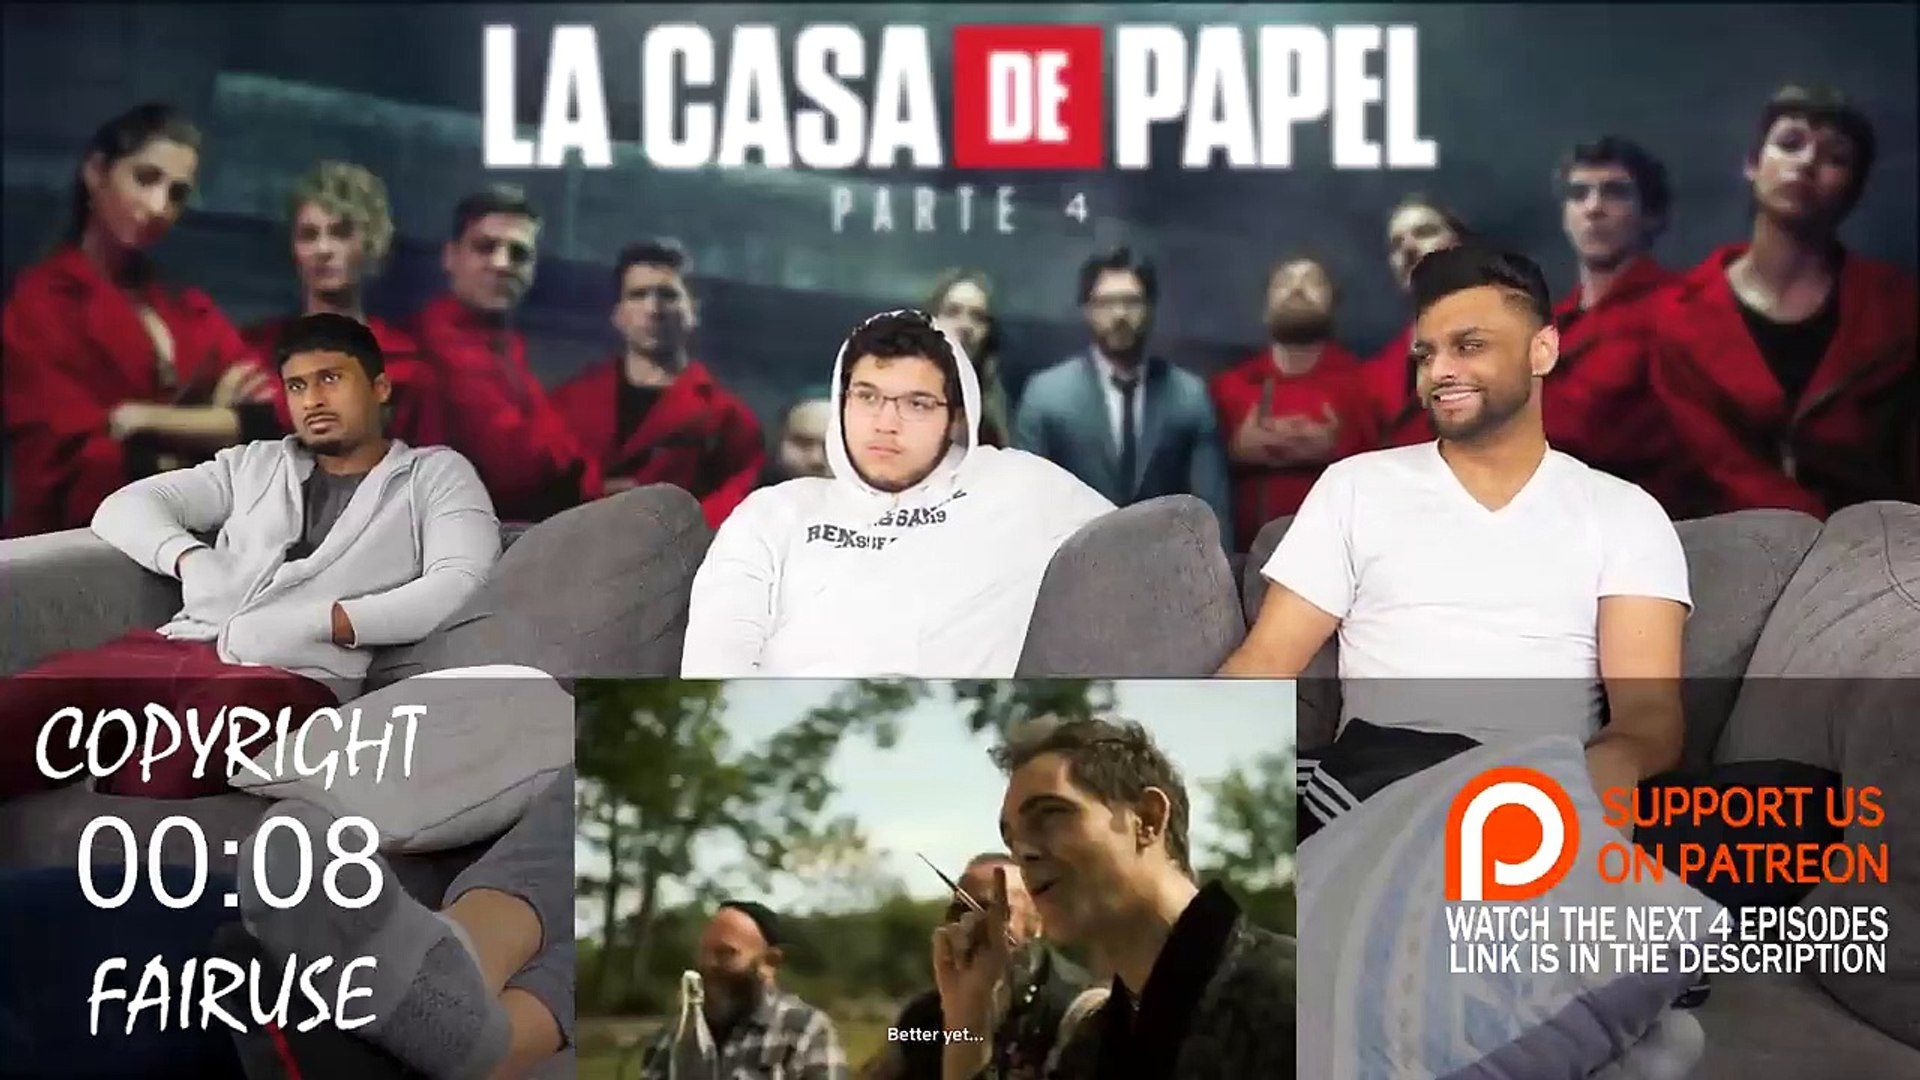 La Casa De Papel (Money Heist) - 4x5 -minutos antes- REACTION + REVIEW!